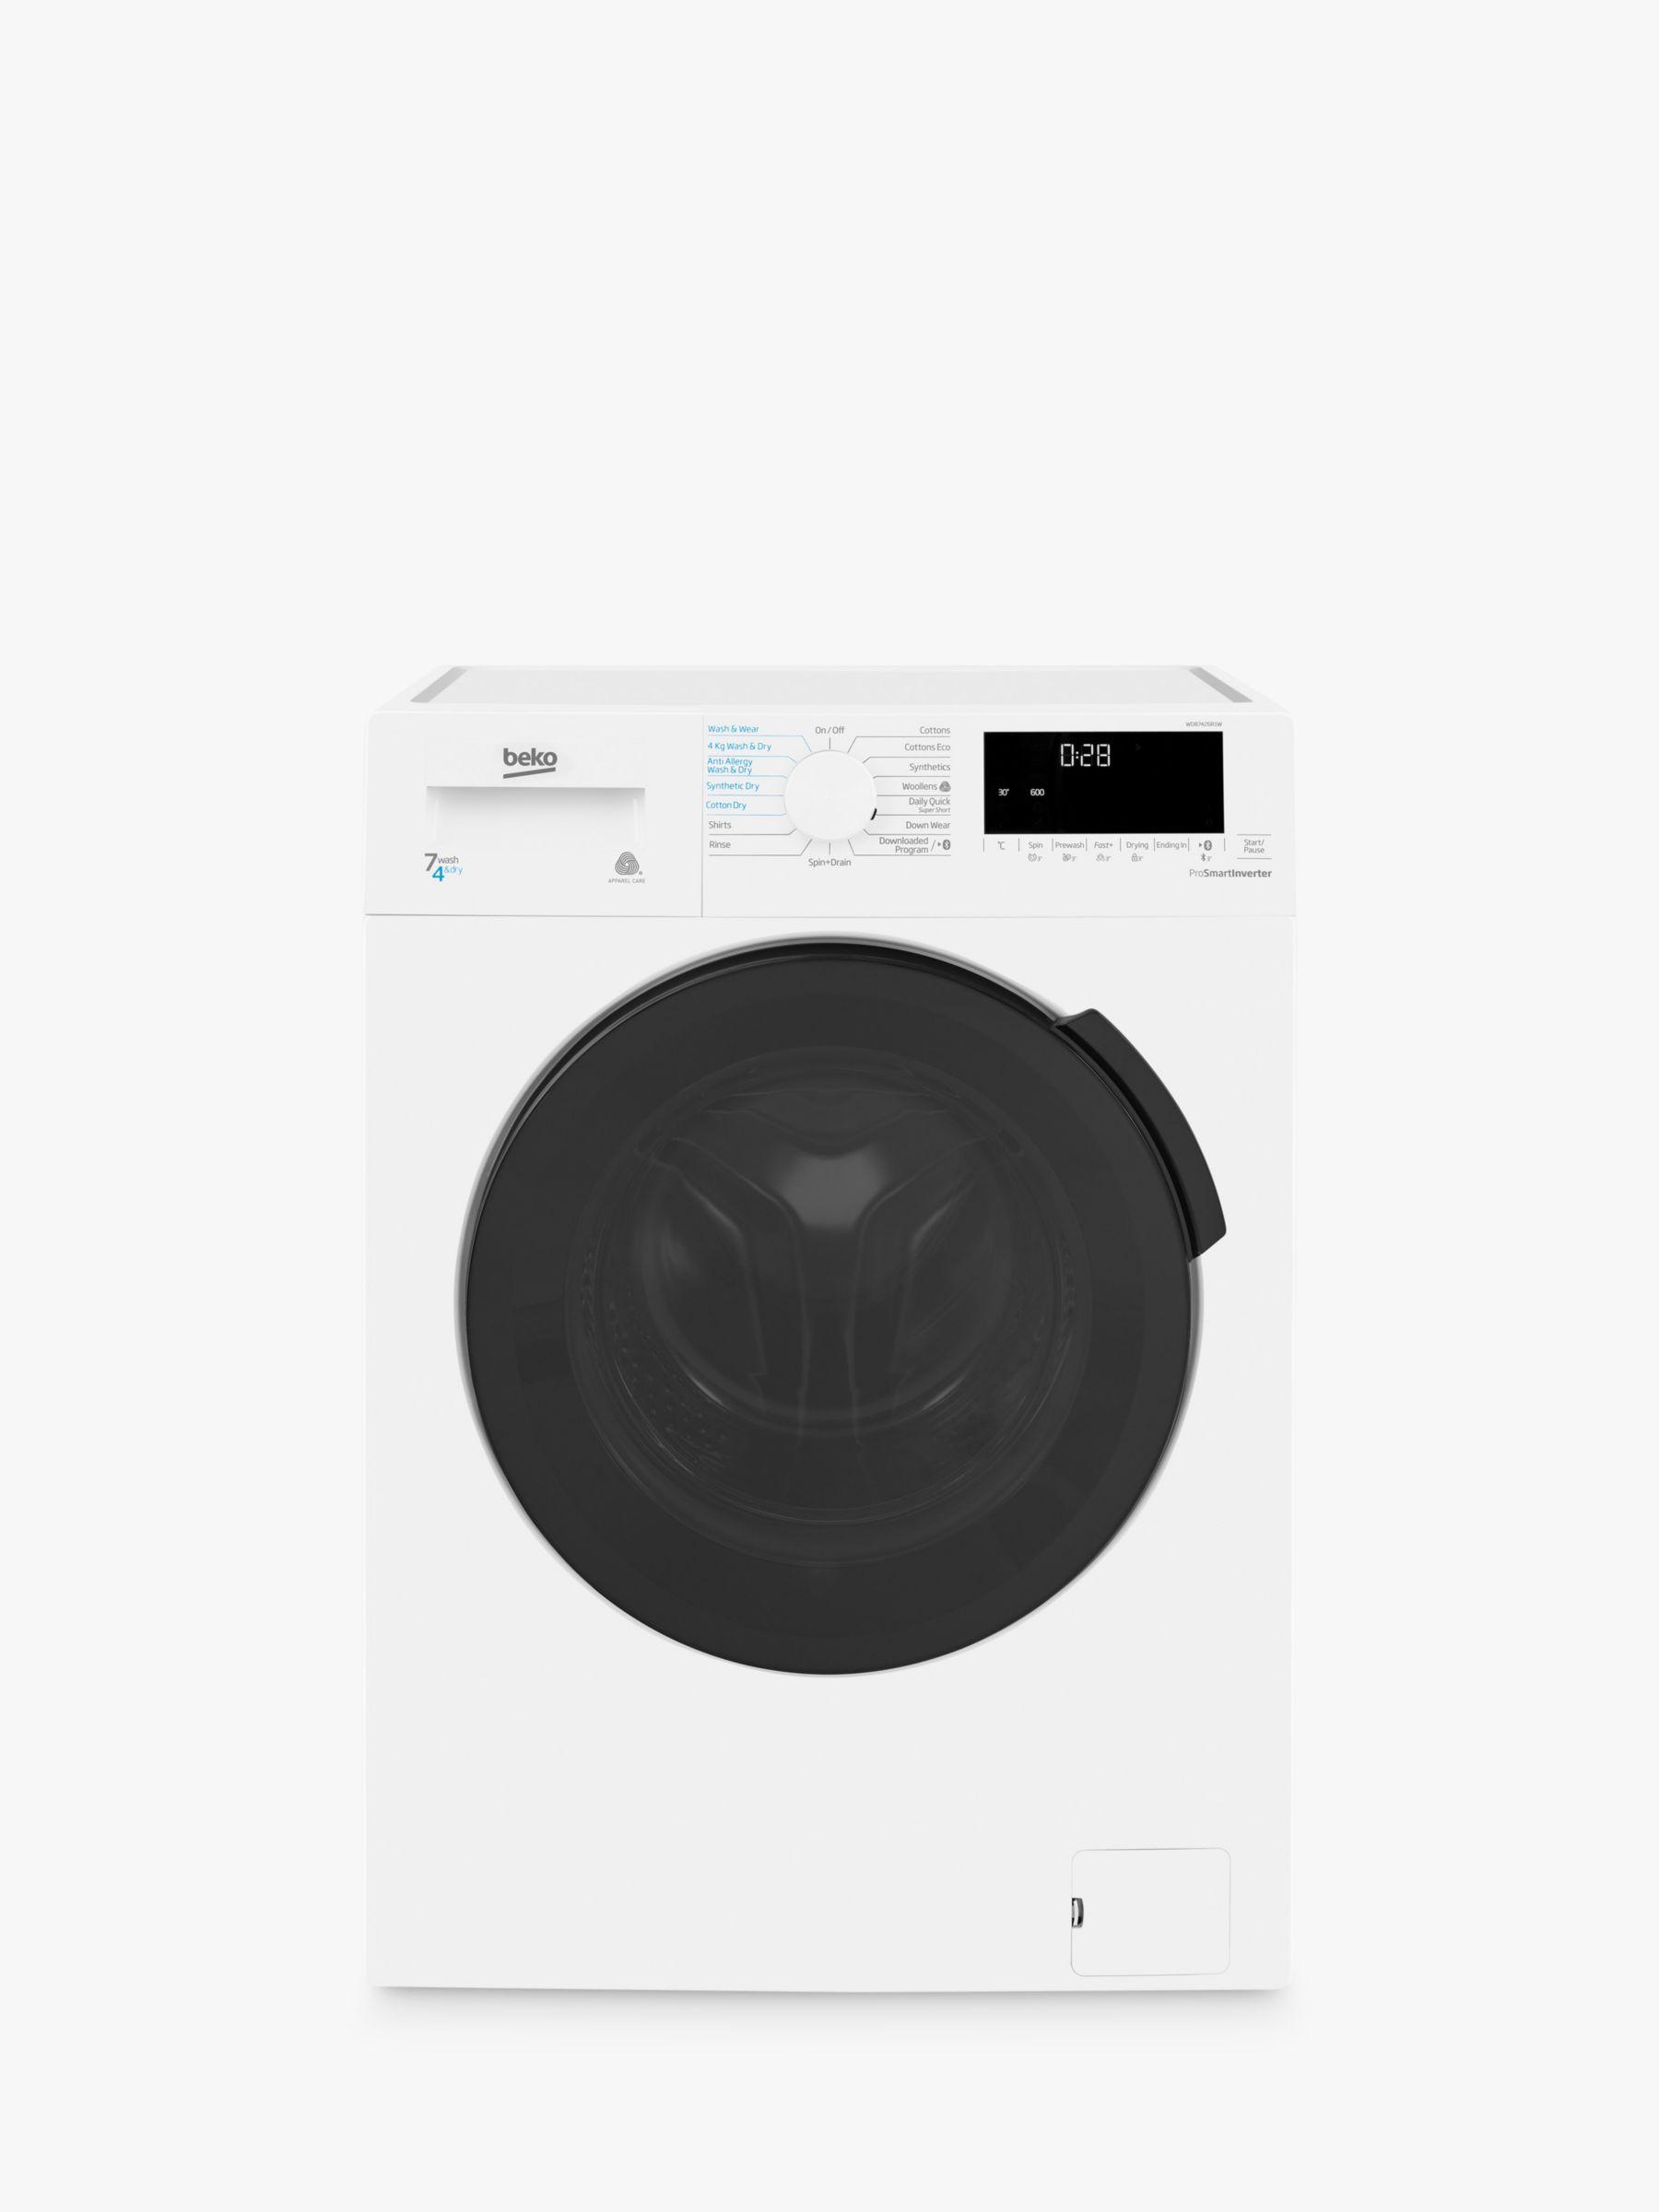 Beko Beko WDB7426R1W Freestanding Washer Dryer, 7kg Wash/4kg Dry Load, B Energy Rating, 1200rpm Spin, White